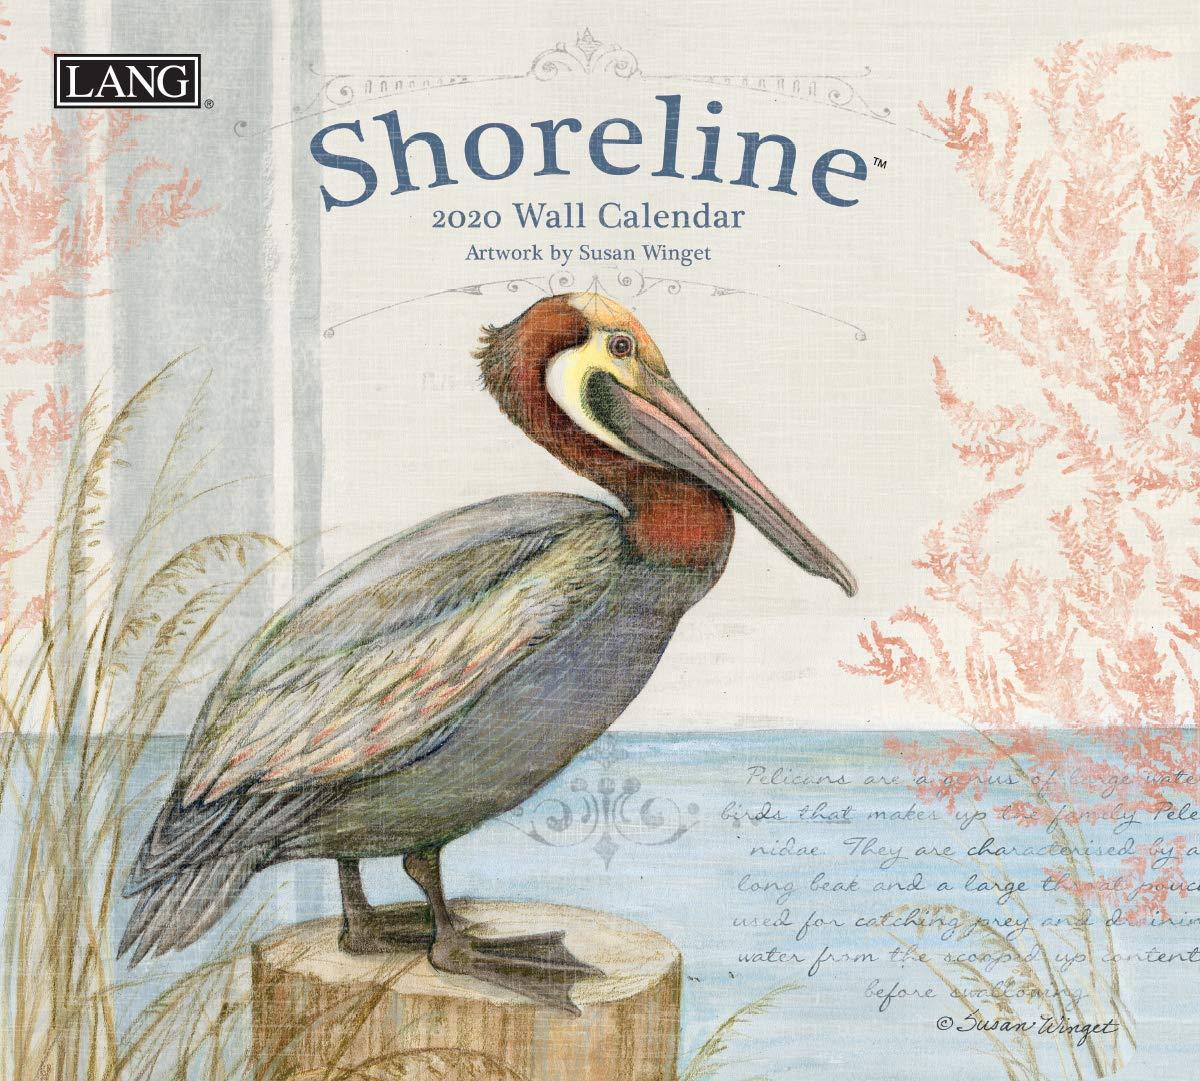 20991001993 The LANG Companies Shoreline 2020 Wall Calendar Office ...